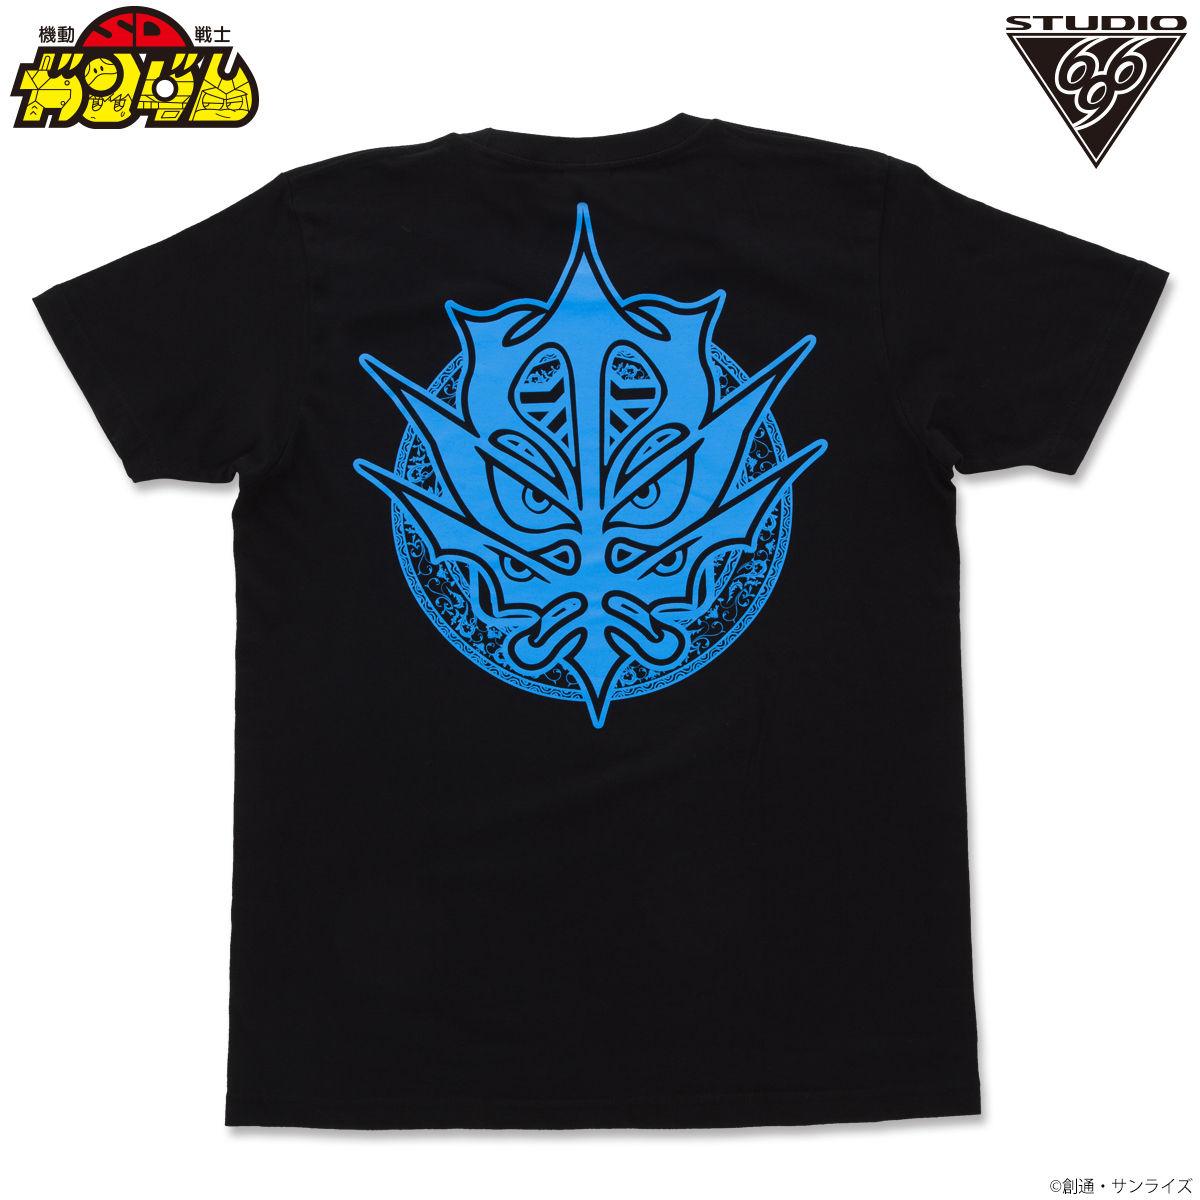 SD鋼彈 巨人重鋼彈魔像與泥塑巨人 T-SHIRT feat.STUDIO696